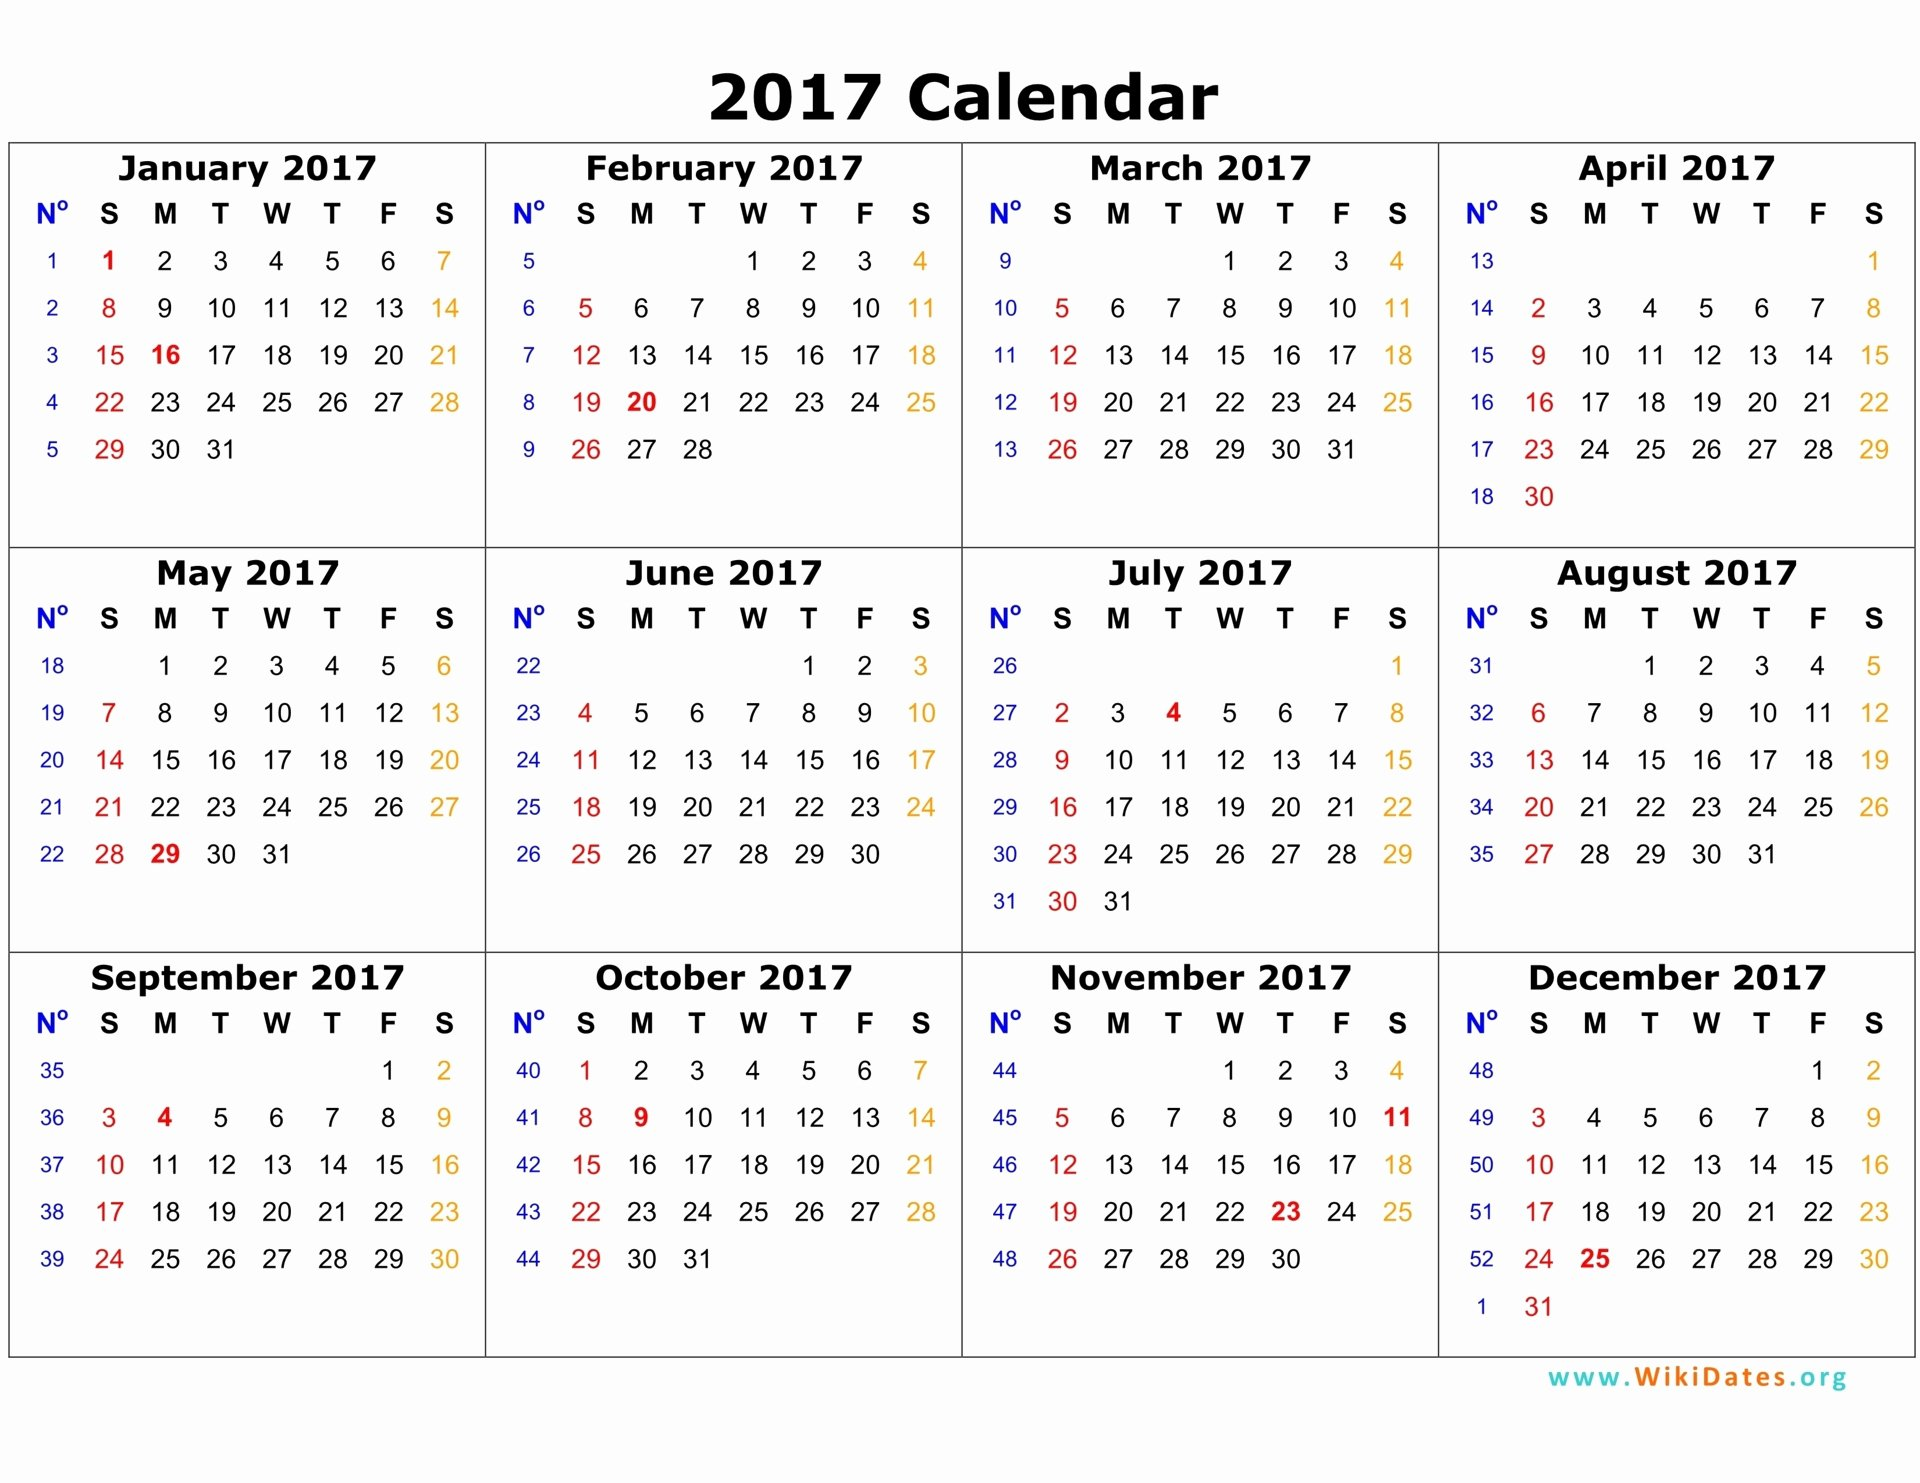 2017 Payroll Calendar Template Fresh 2017 Calendar